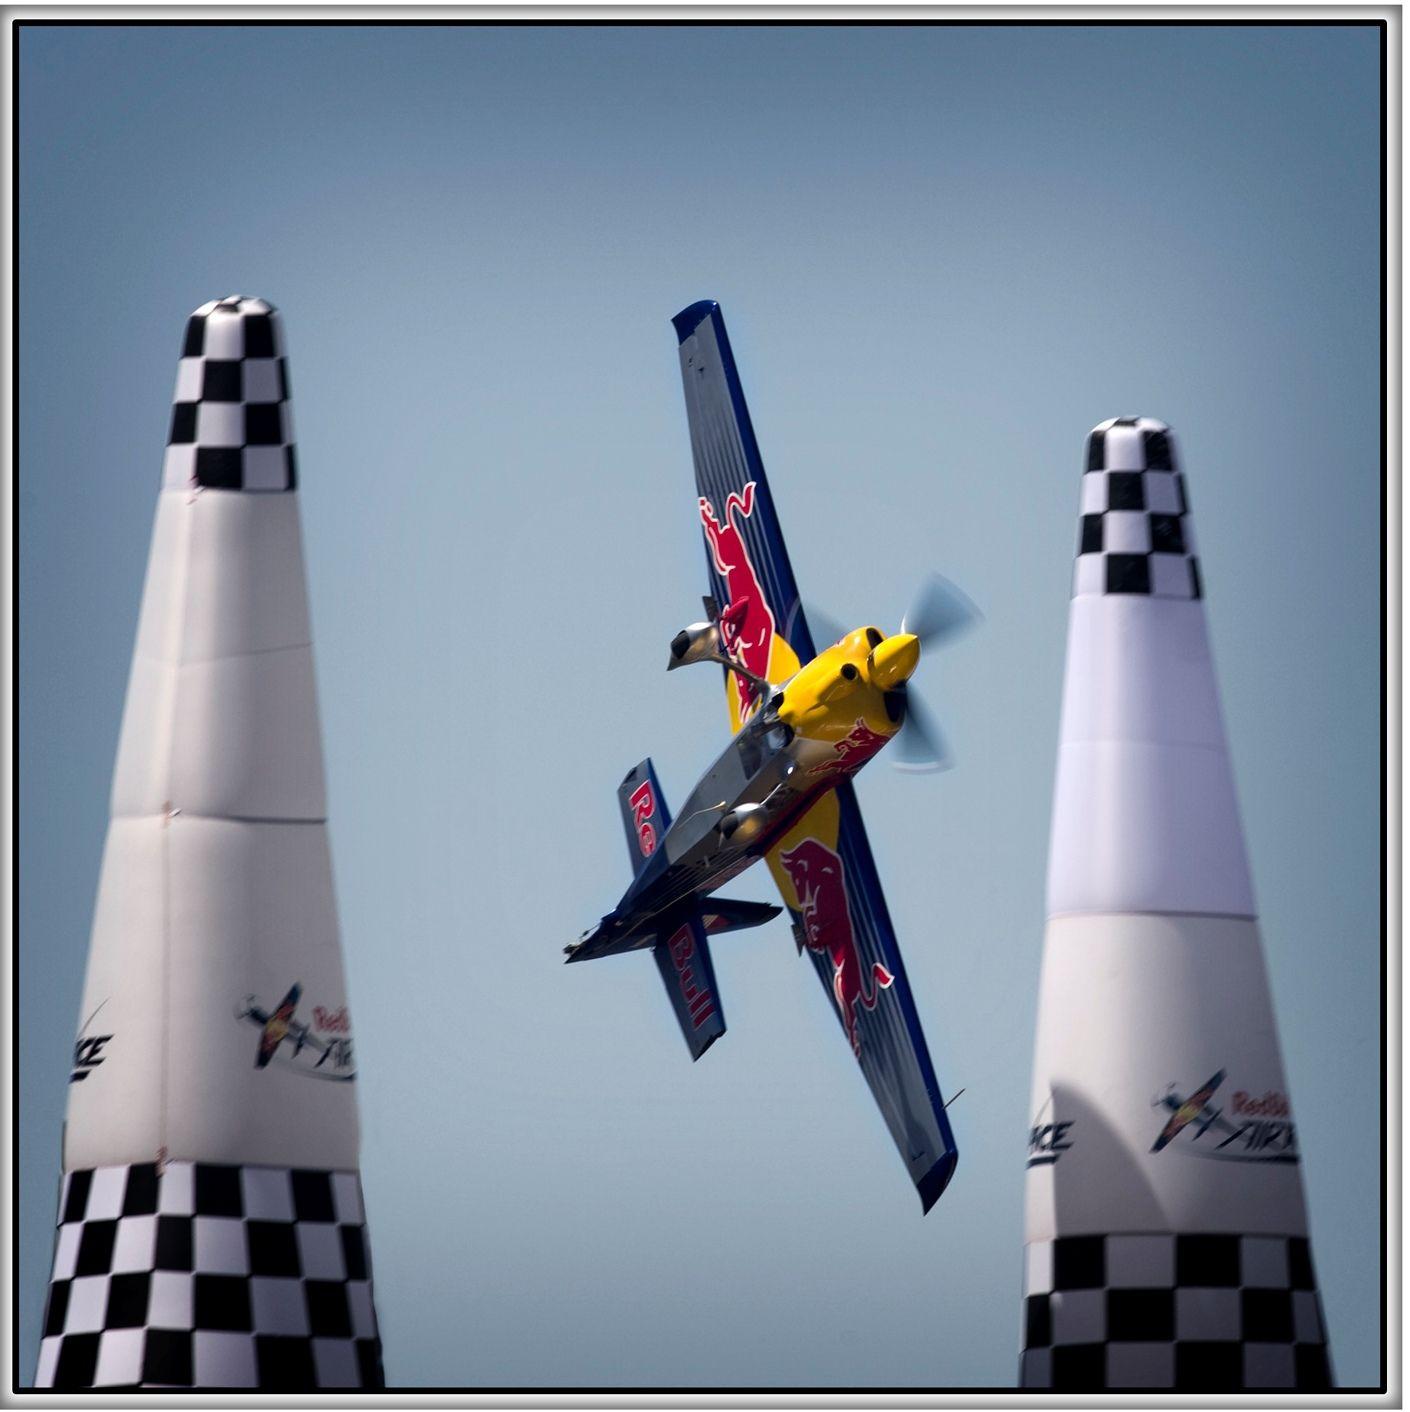 Red Bull Air Racing 2008 Air race, Reno air races, Air